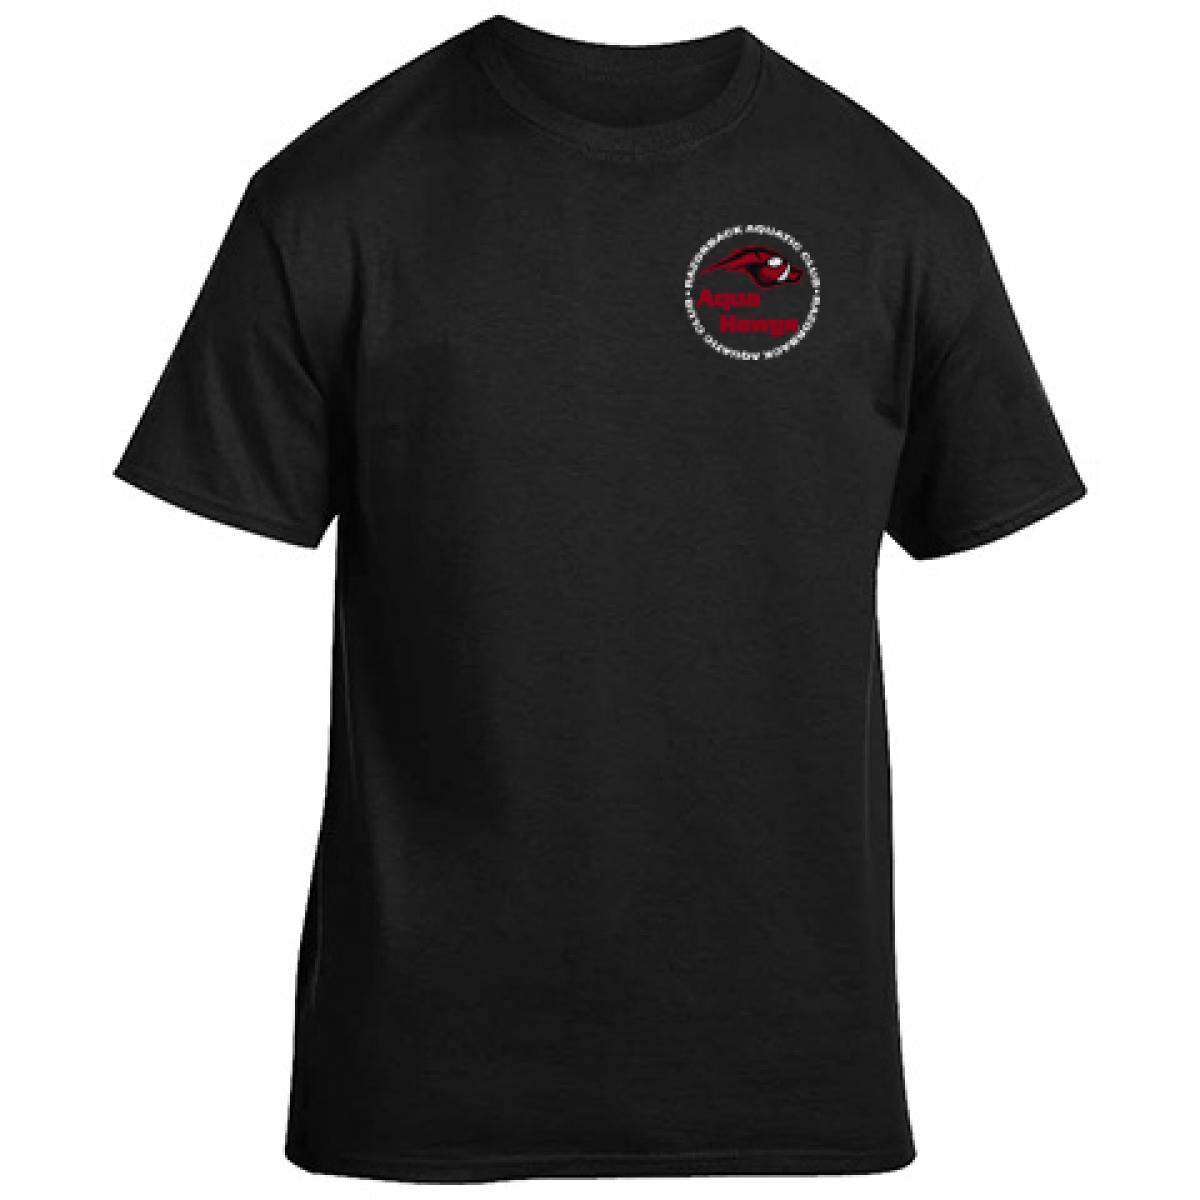 Gildan Cotton Short Sleeve T-Shirt - Black-Black-2XL